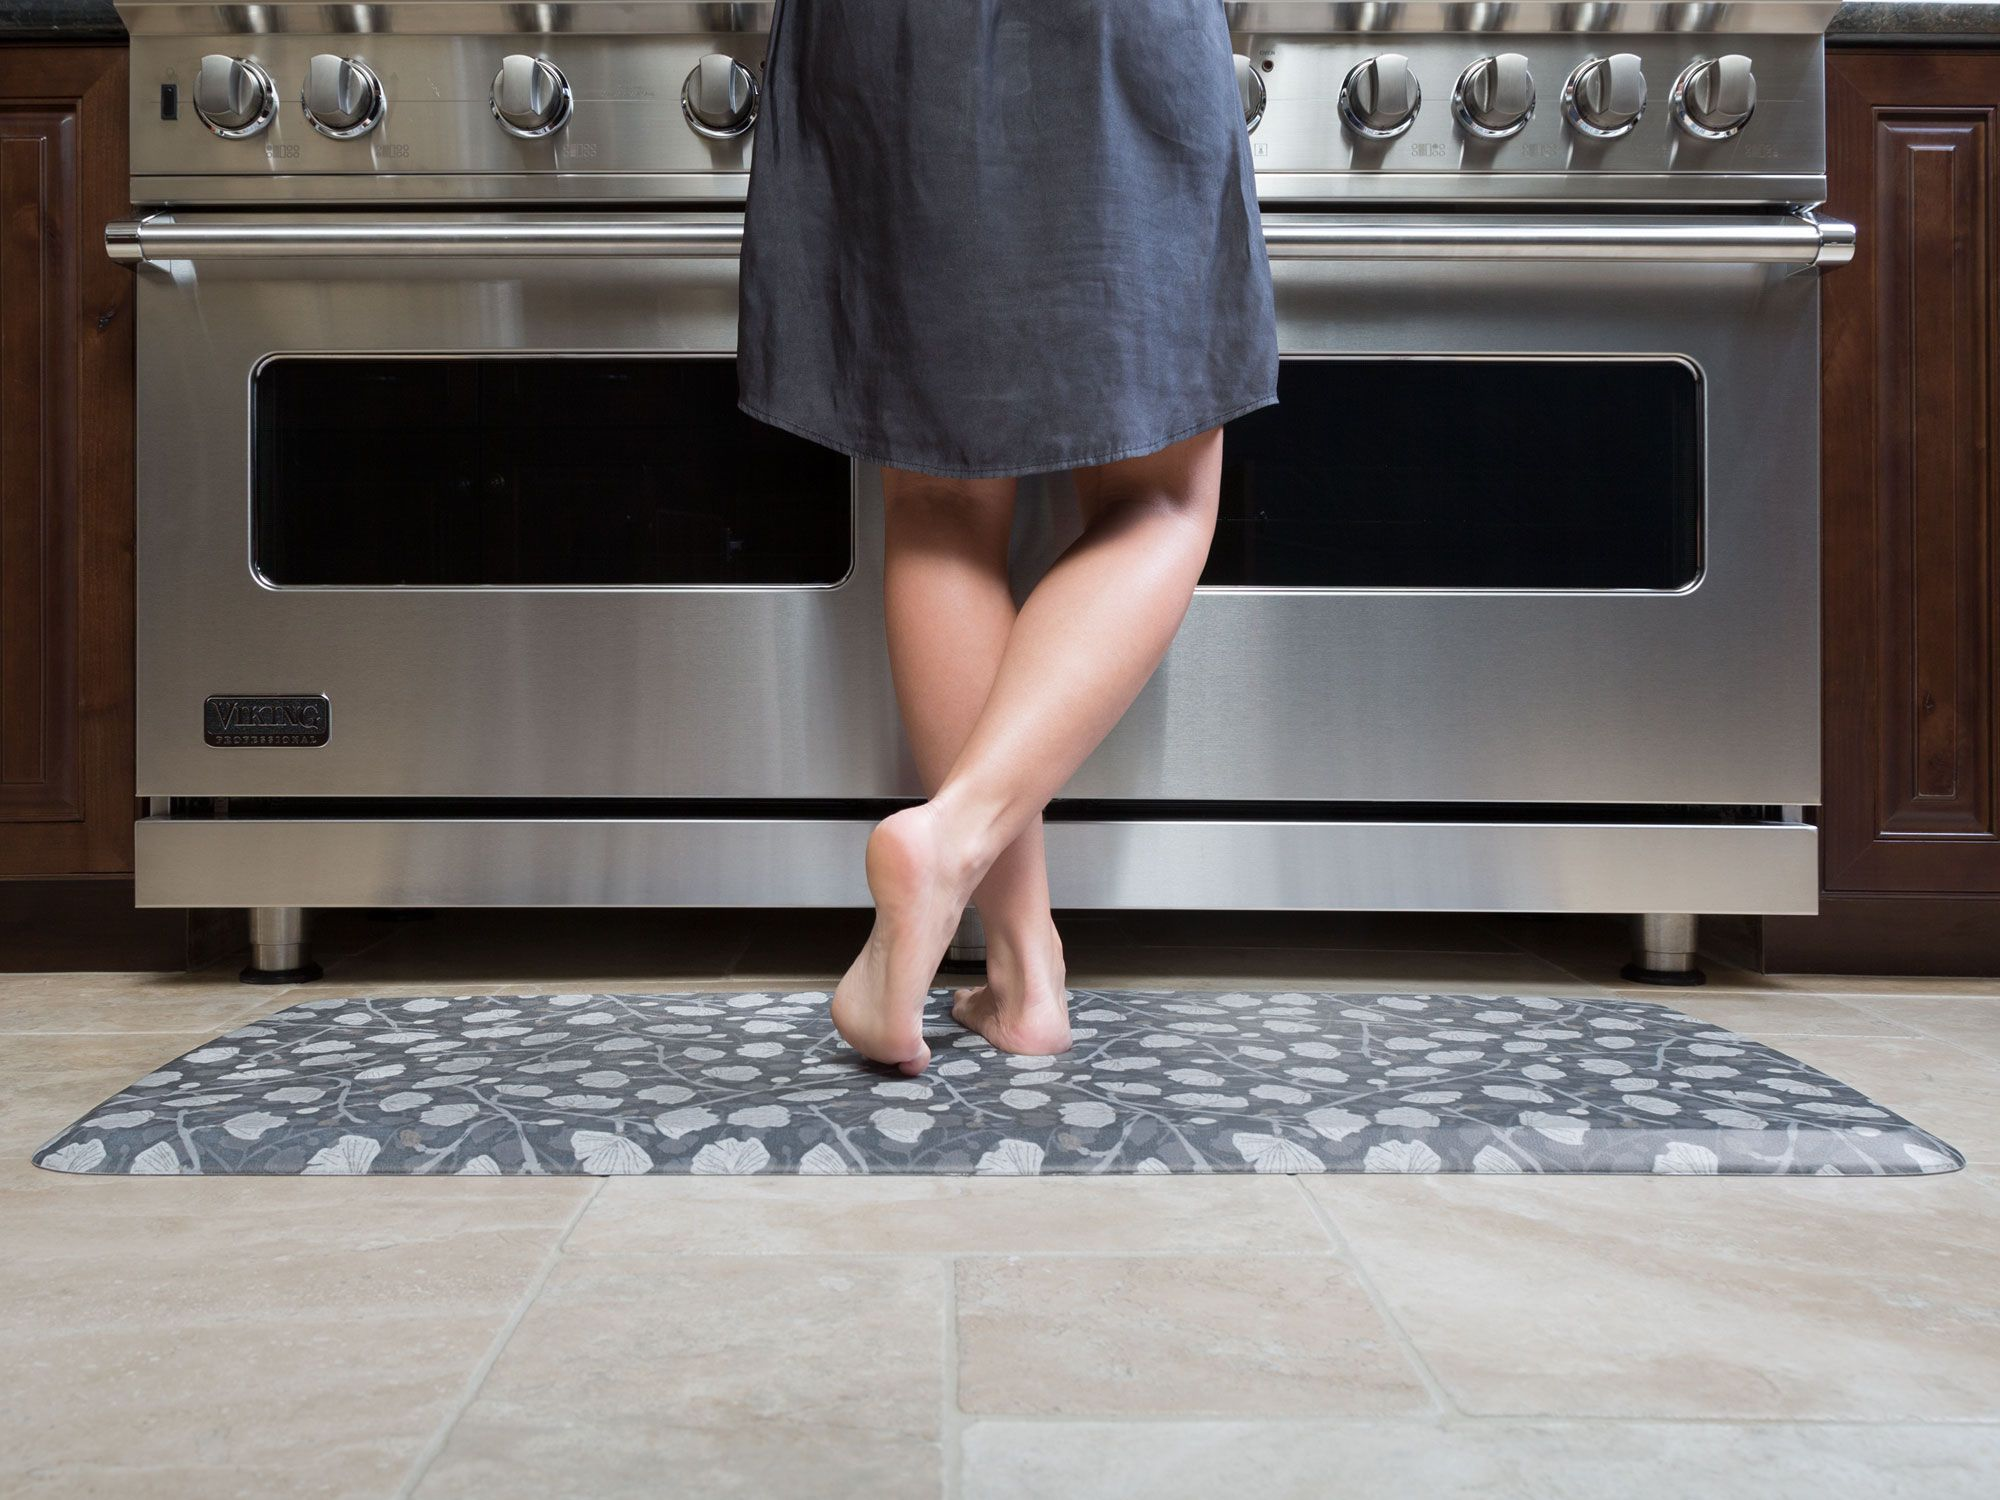 Elite Mat Decorator Collection Organic Anti Fatigue Kitchen Mats